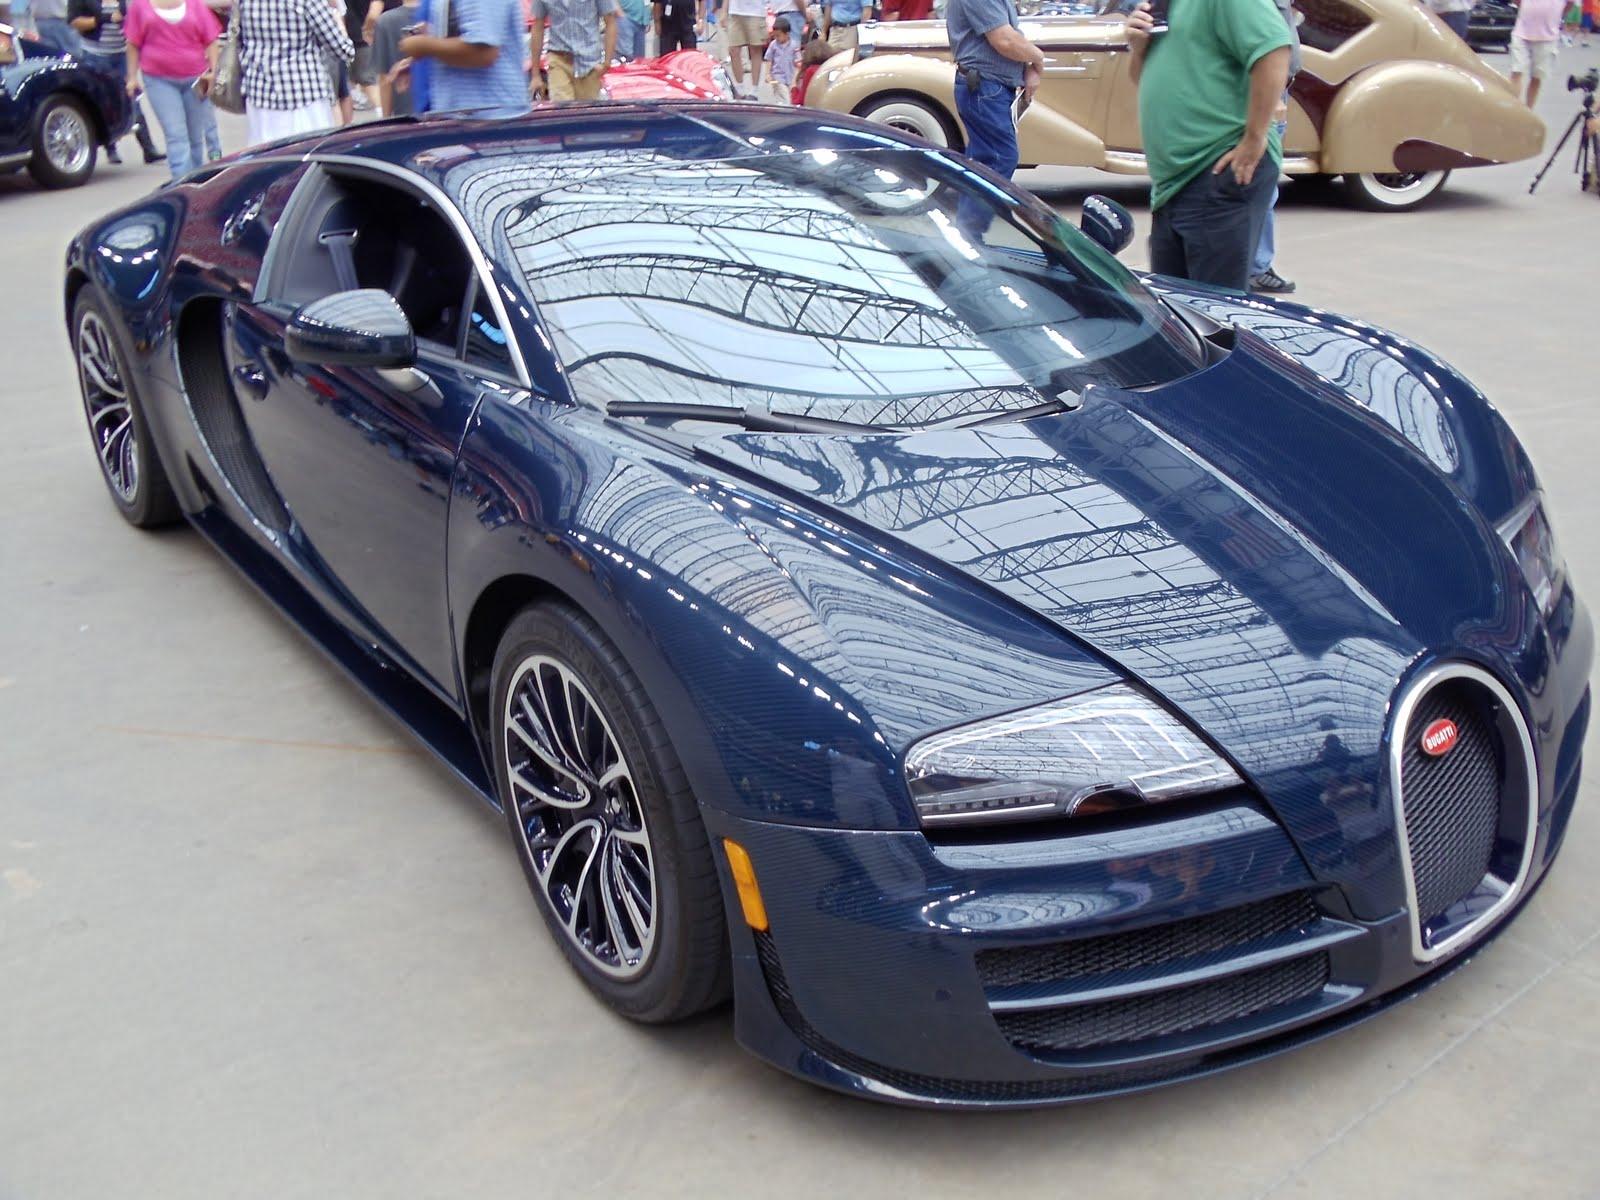 2011+Bugatti+Veyron+16.4+Super+Sport Mesmerizing Bugatti Veyron Nfs Most Wanted Cars Trend